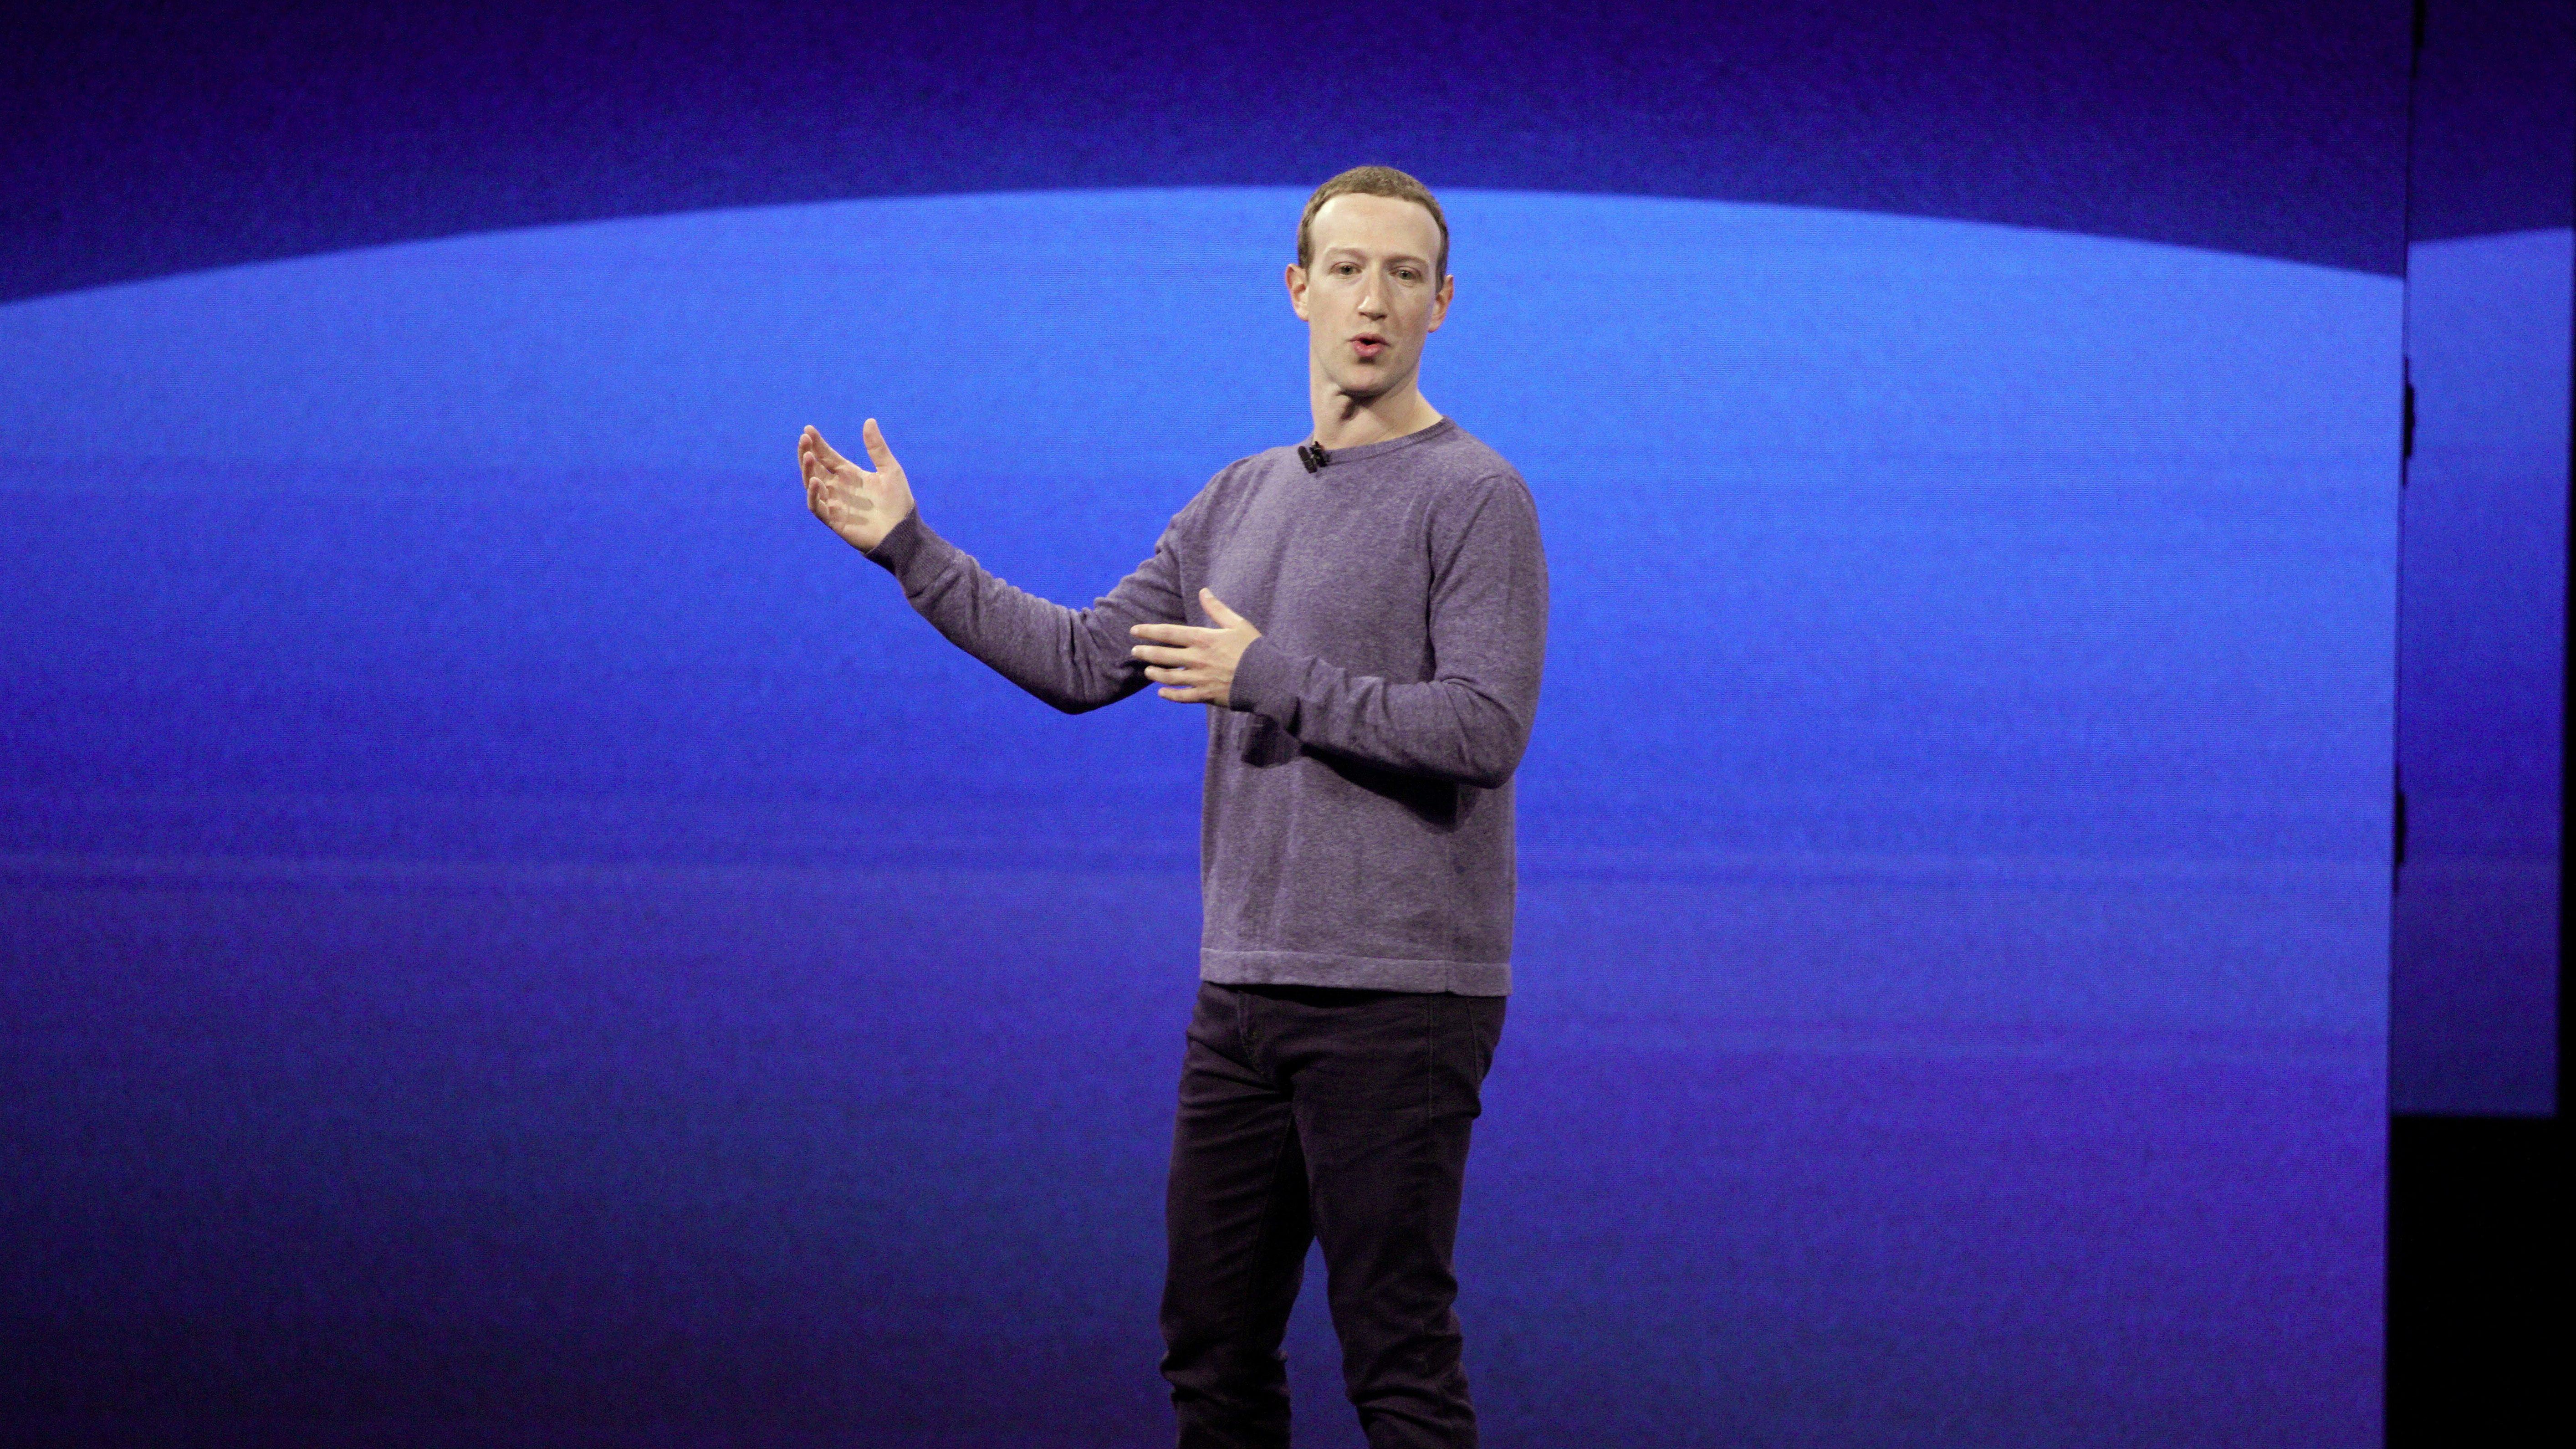 Facebook founder Mark Zuckerberg